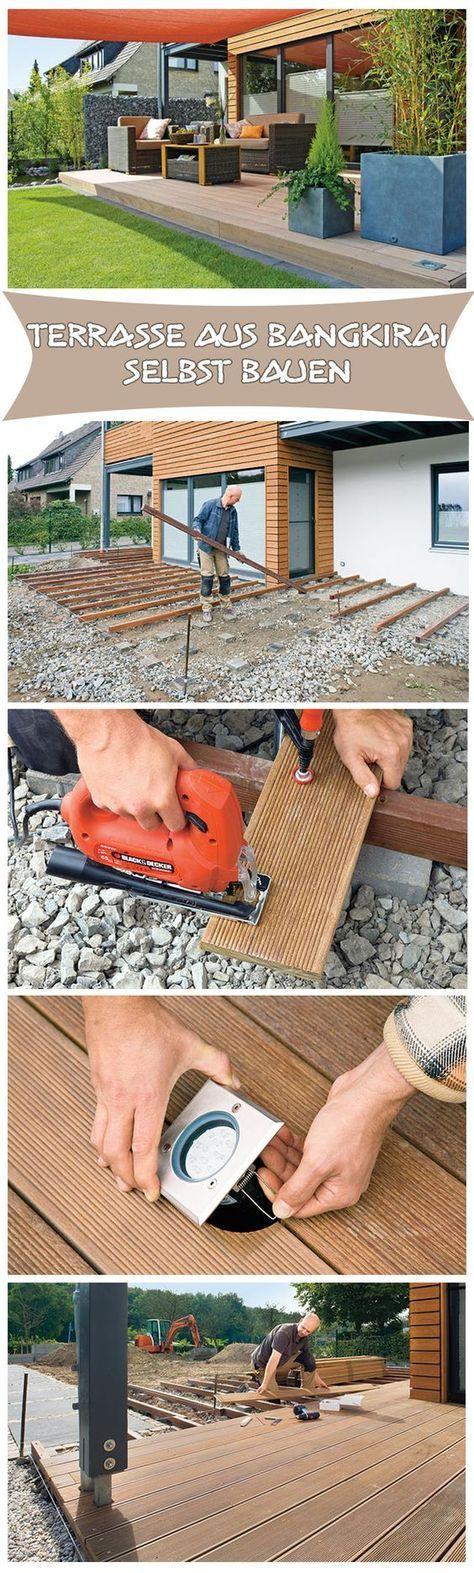 Terrasse sur terrain en pente en 10 idées du0027aménagement moderne - beispiel mehrstufige holzterrasse